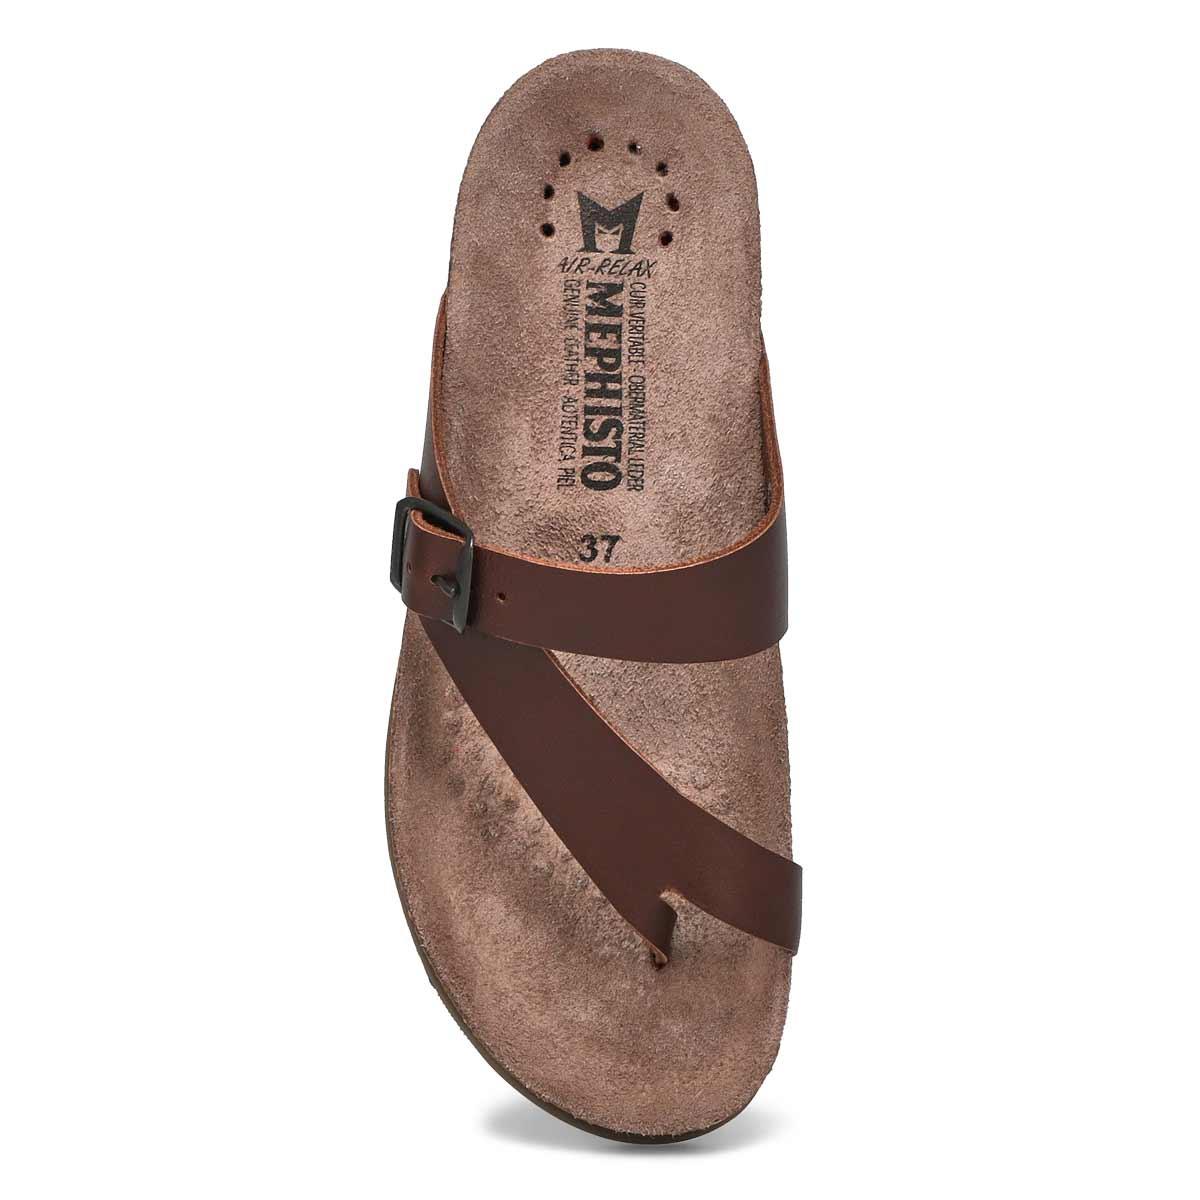 Sandale tong Helen, brun foncé, femmes